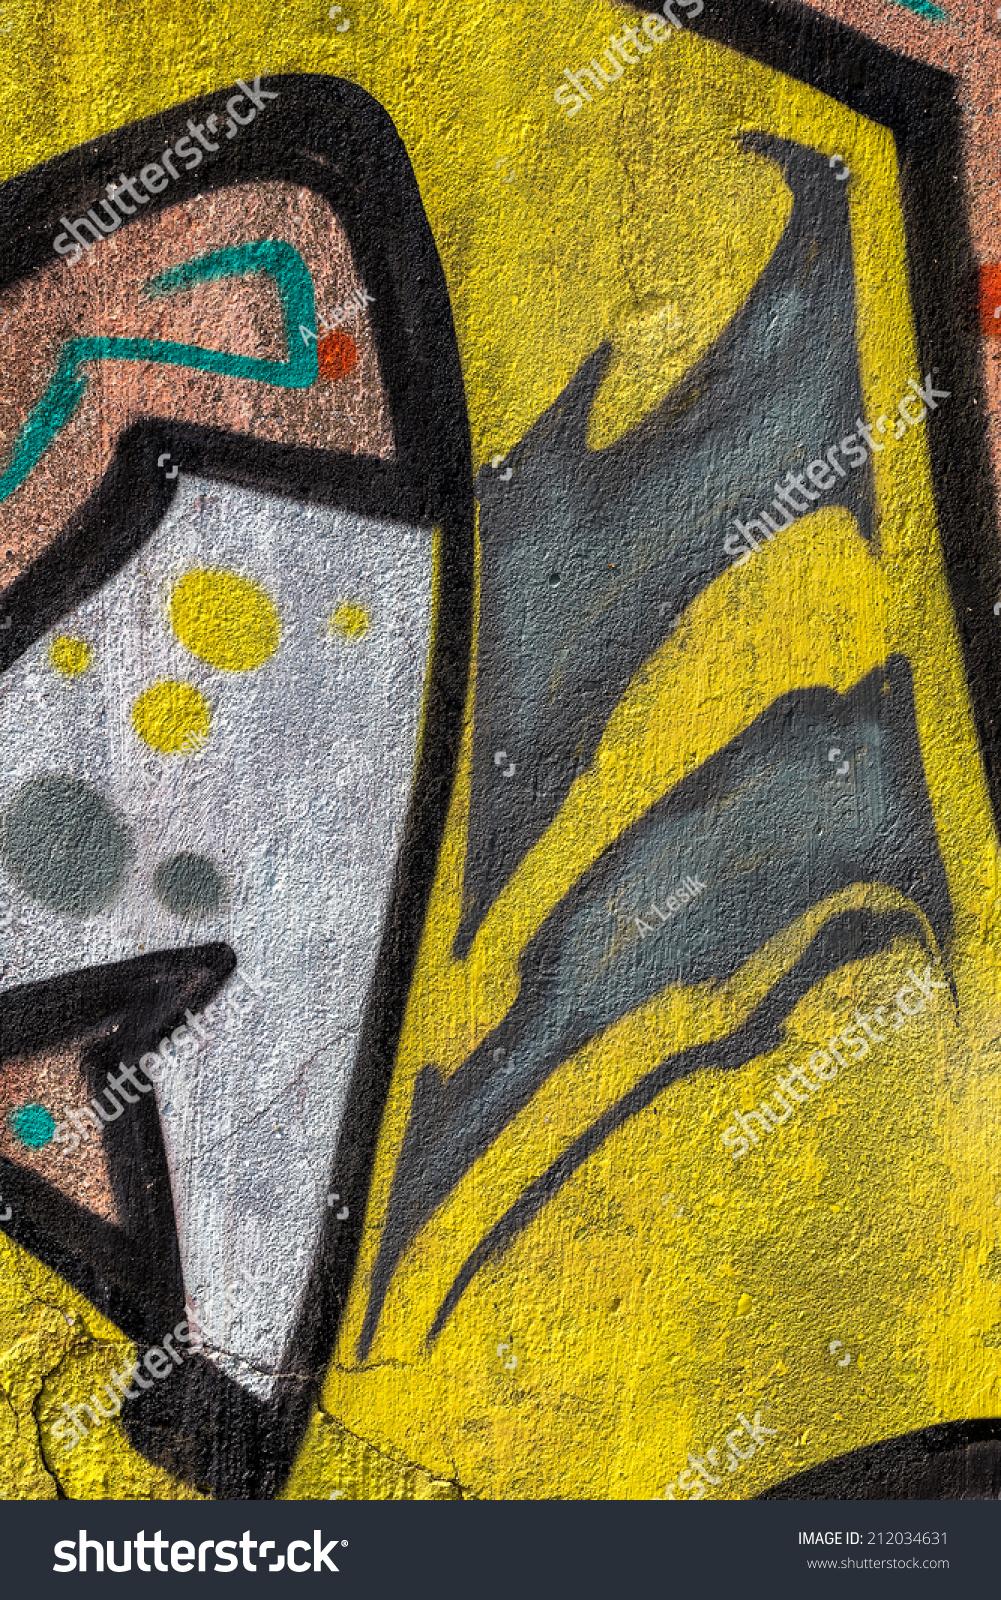 Beautiful Street Art Graffiti Abstract Creative Stock Photo (Edit ...